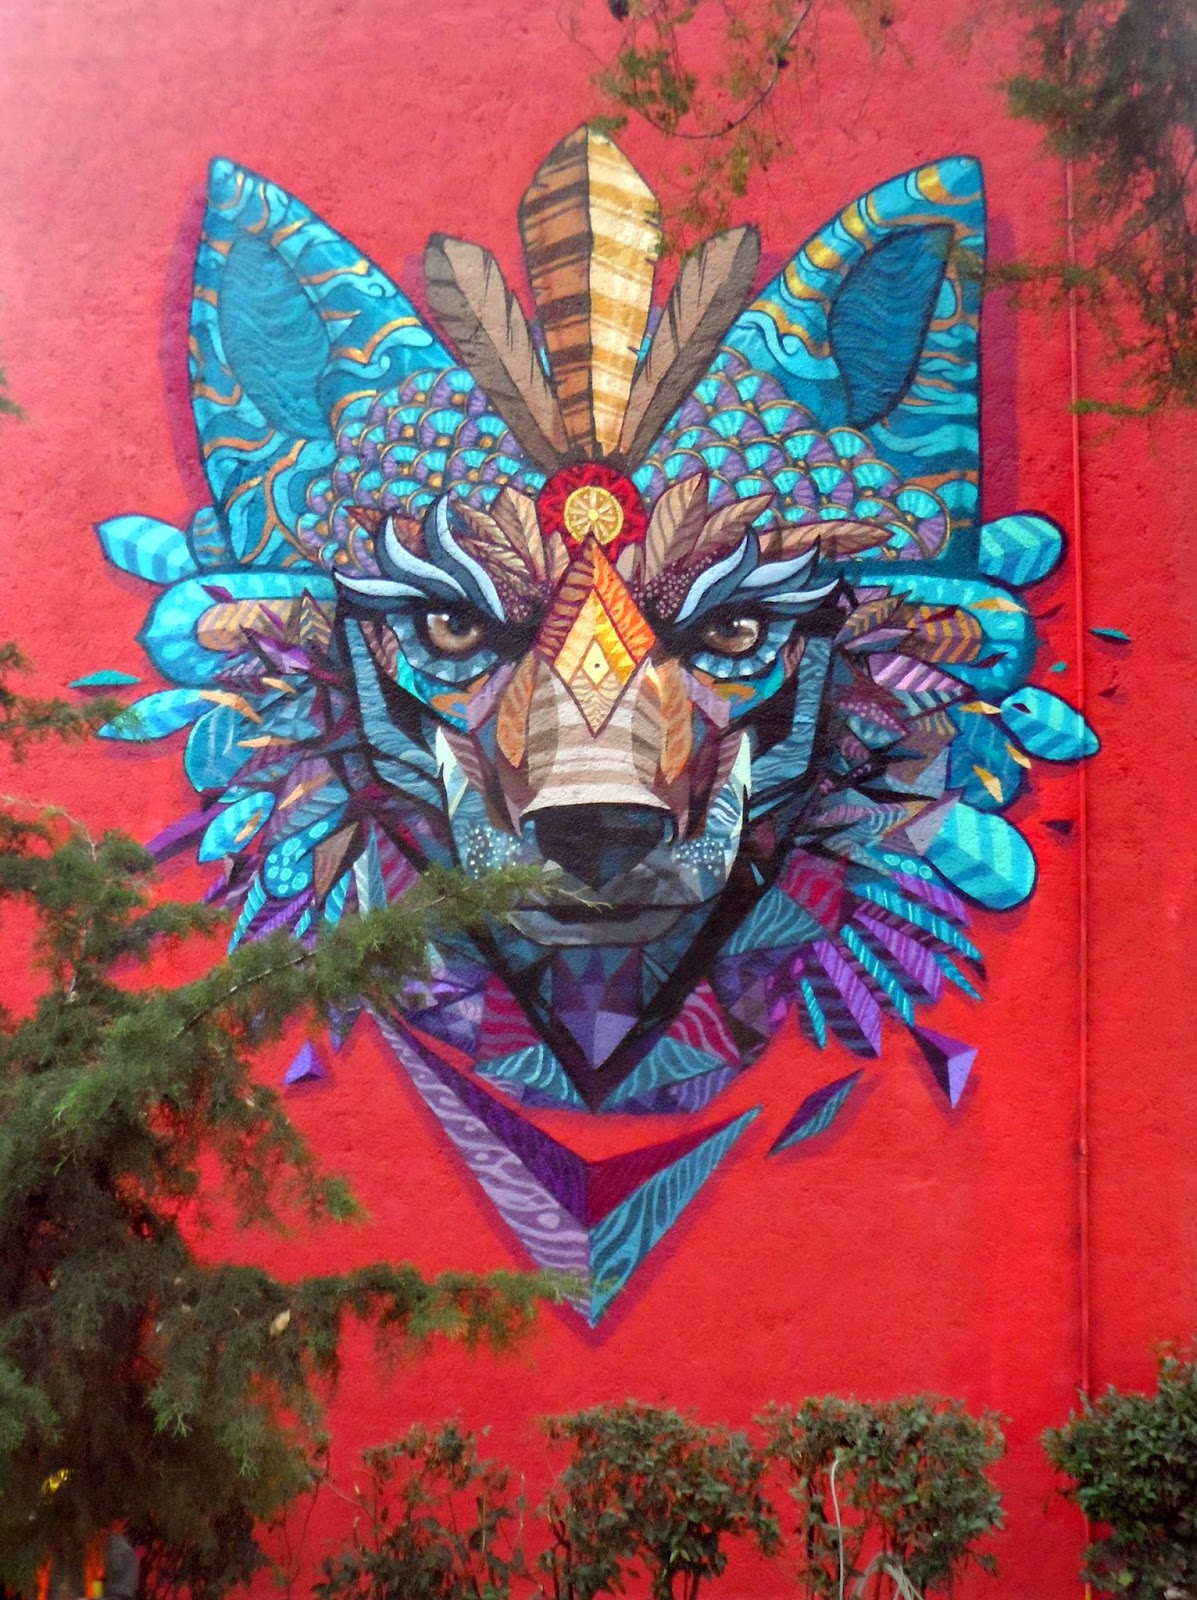 9. Farid Rueda - Mexico